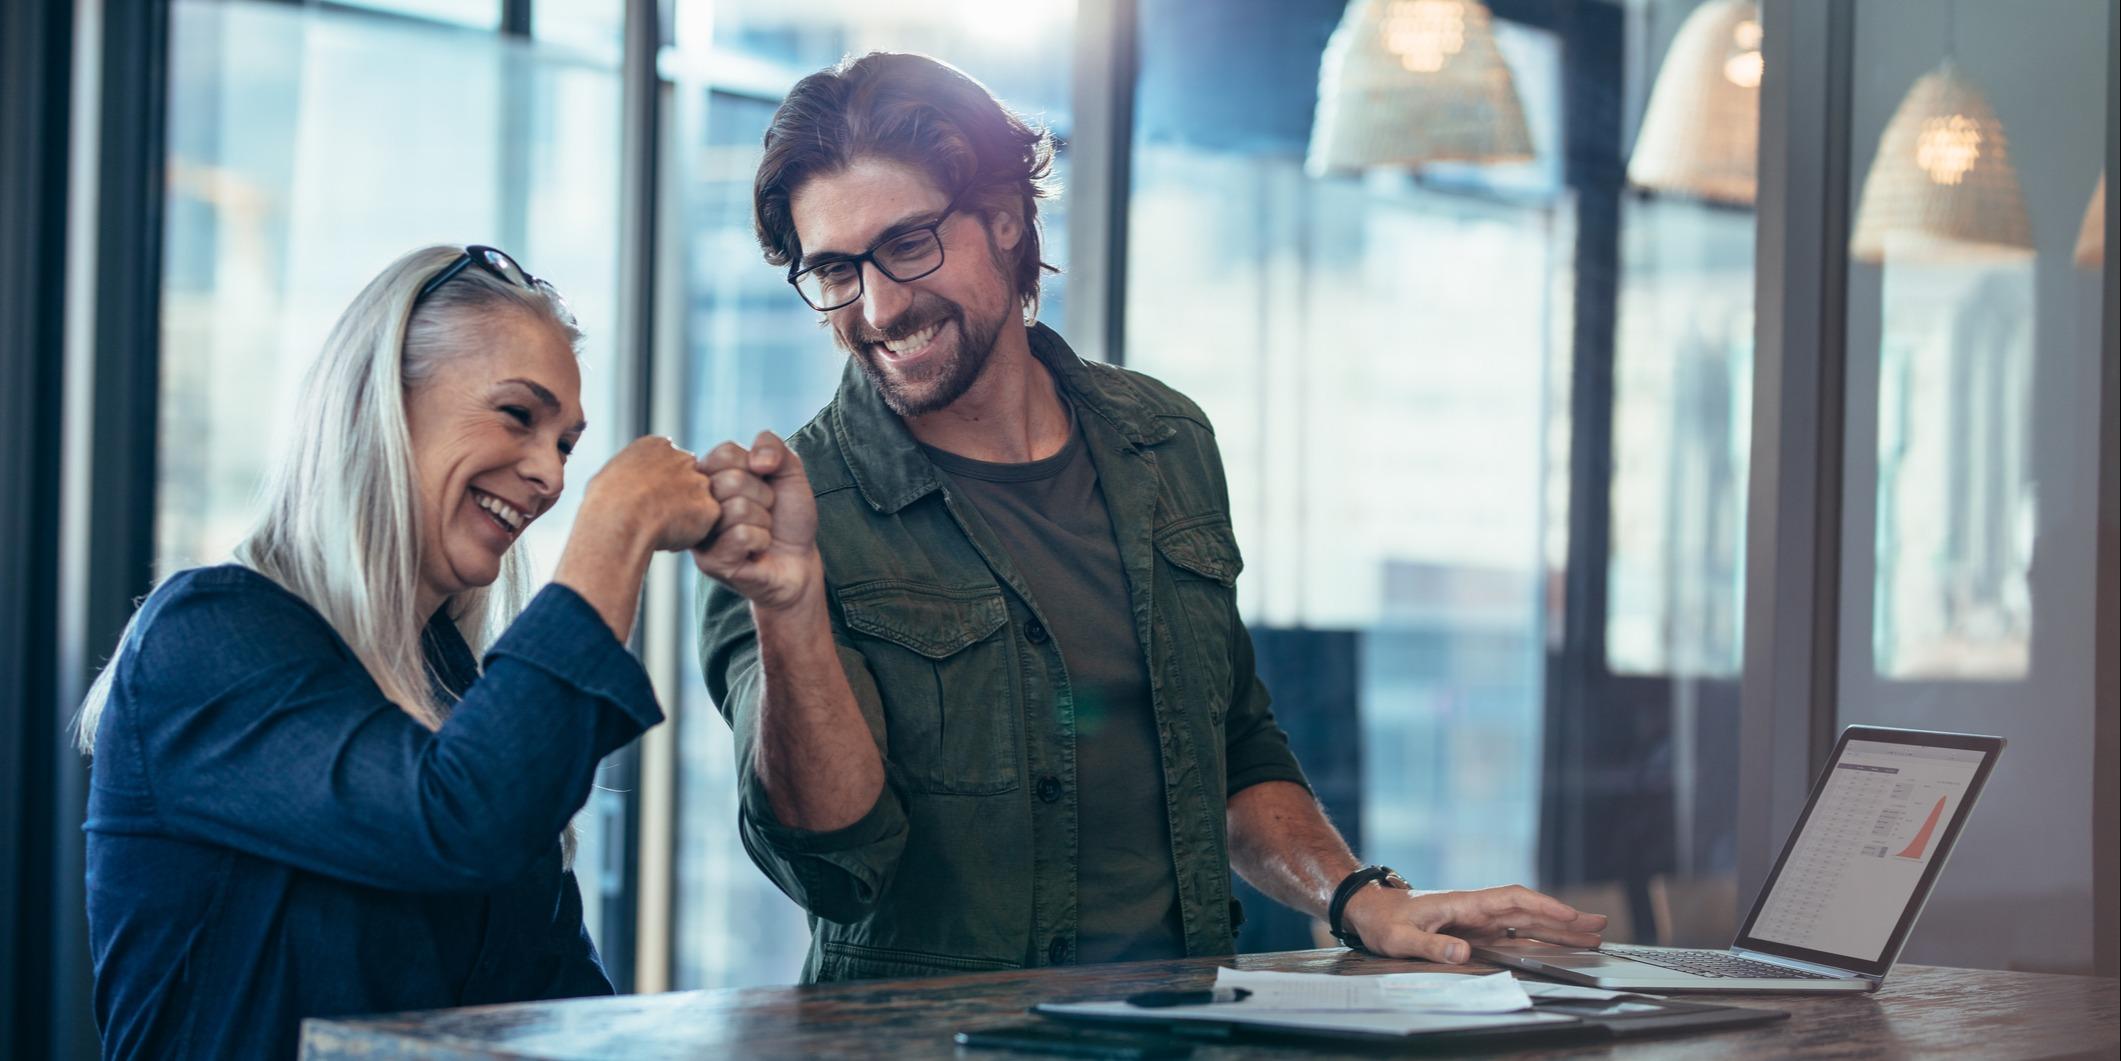 10 Creative Ways to Increase Employee Engagement